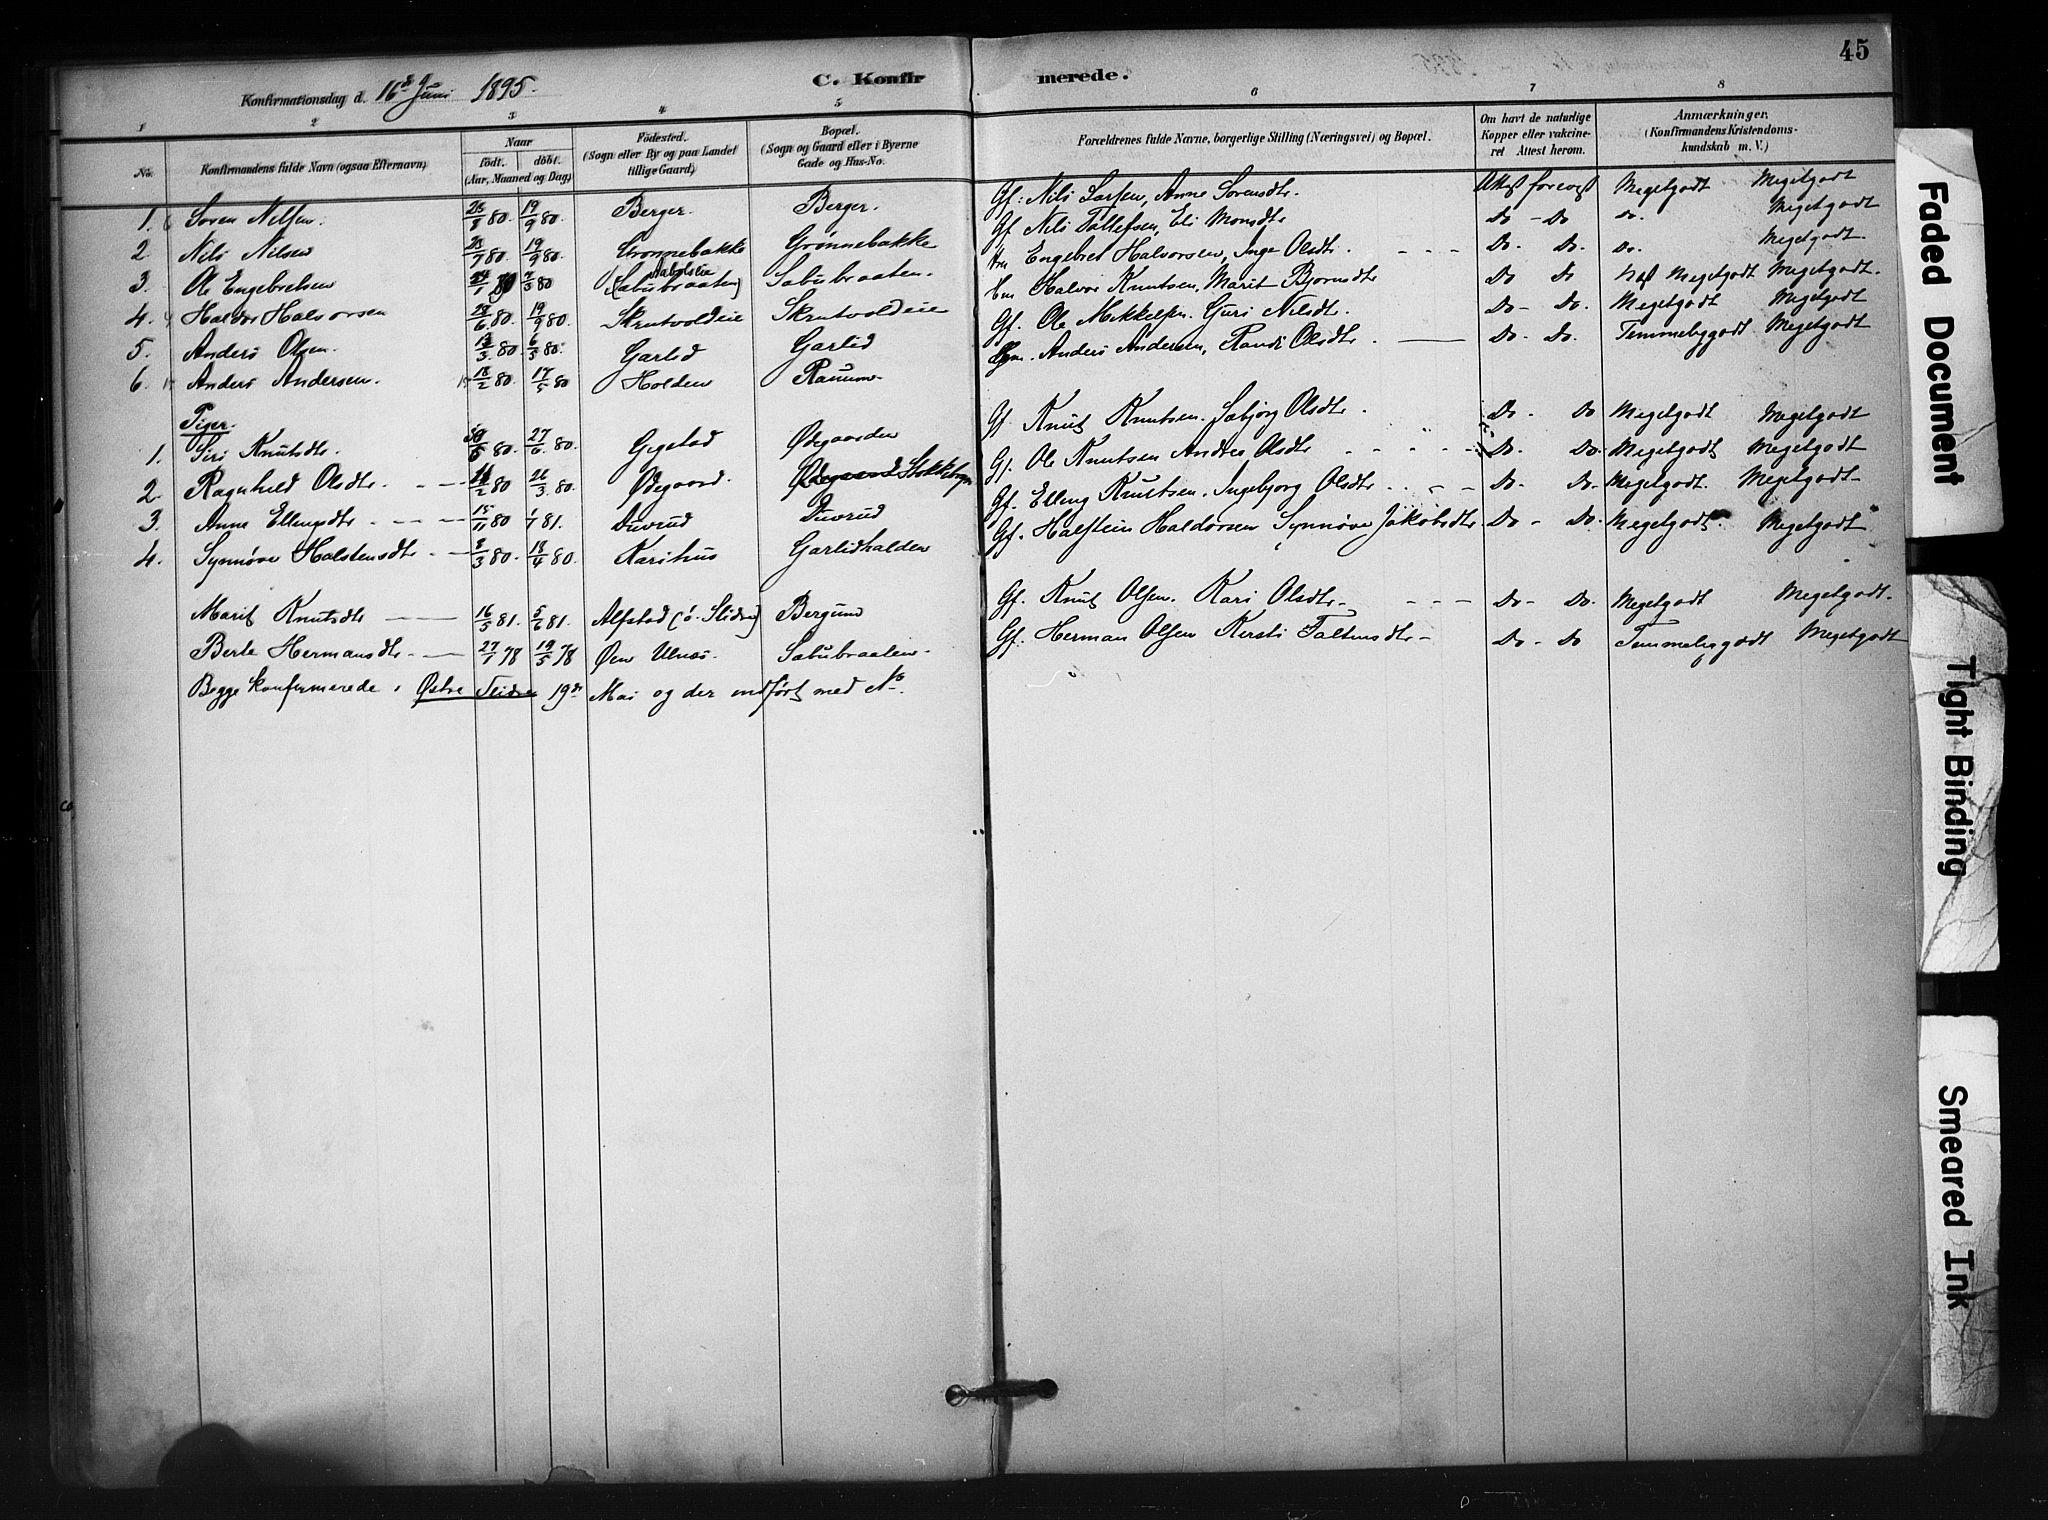 SAH, Nord-Aurdal prestekontor, Ministerialbok nr. 12, 1883-1895, s. 45